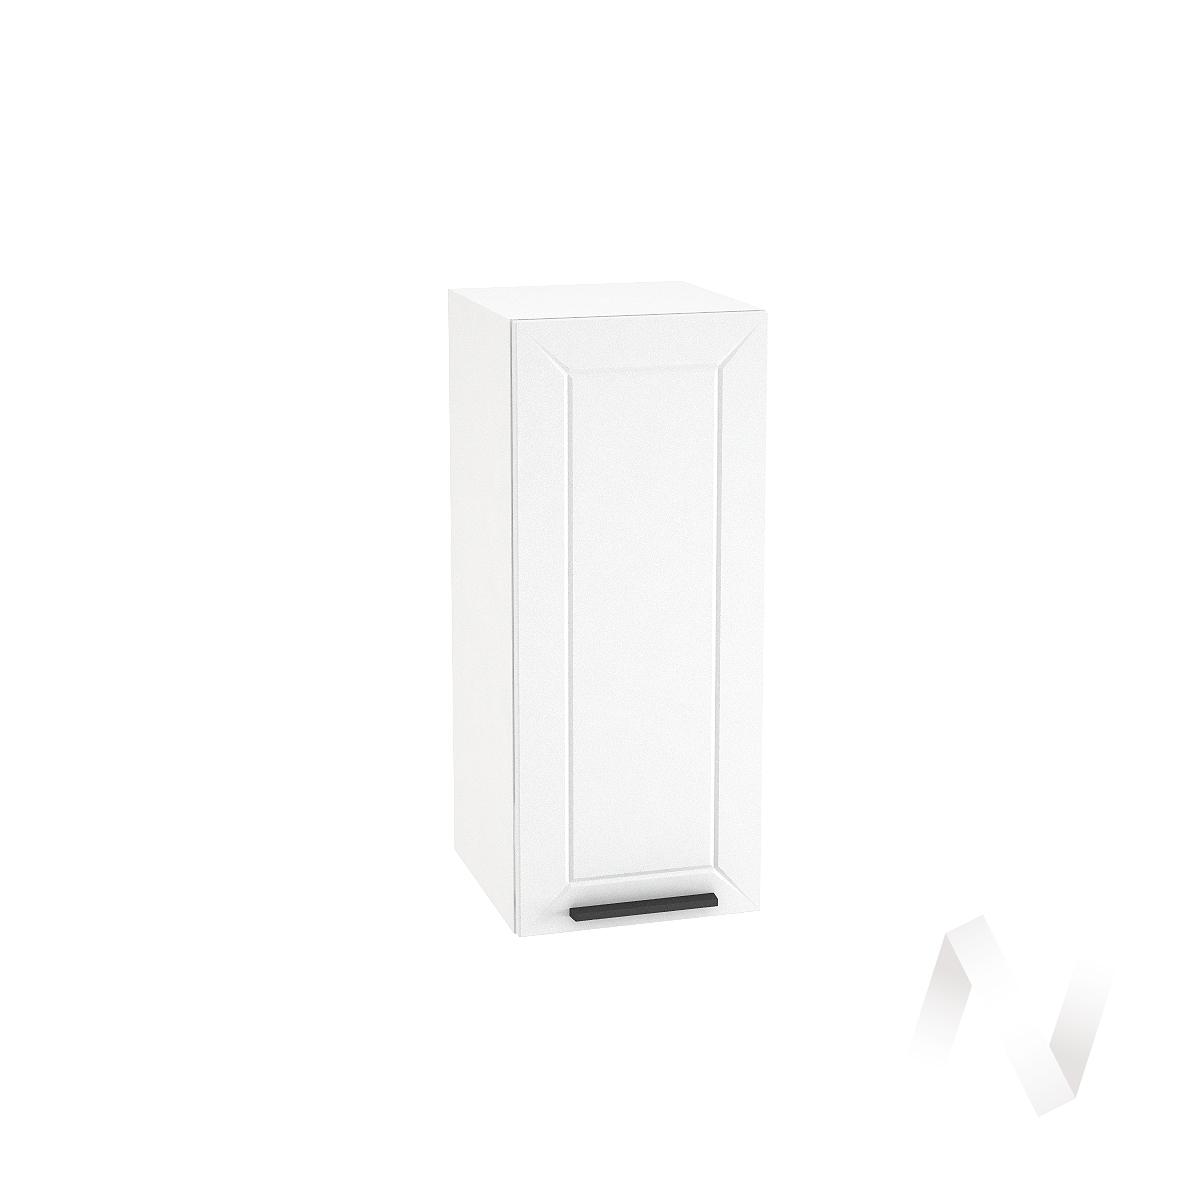 "Кухня ""Глетчер"": Шкаф верхний 300, ШВ 300 (Айленд силк/корпус белый)"